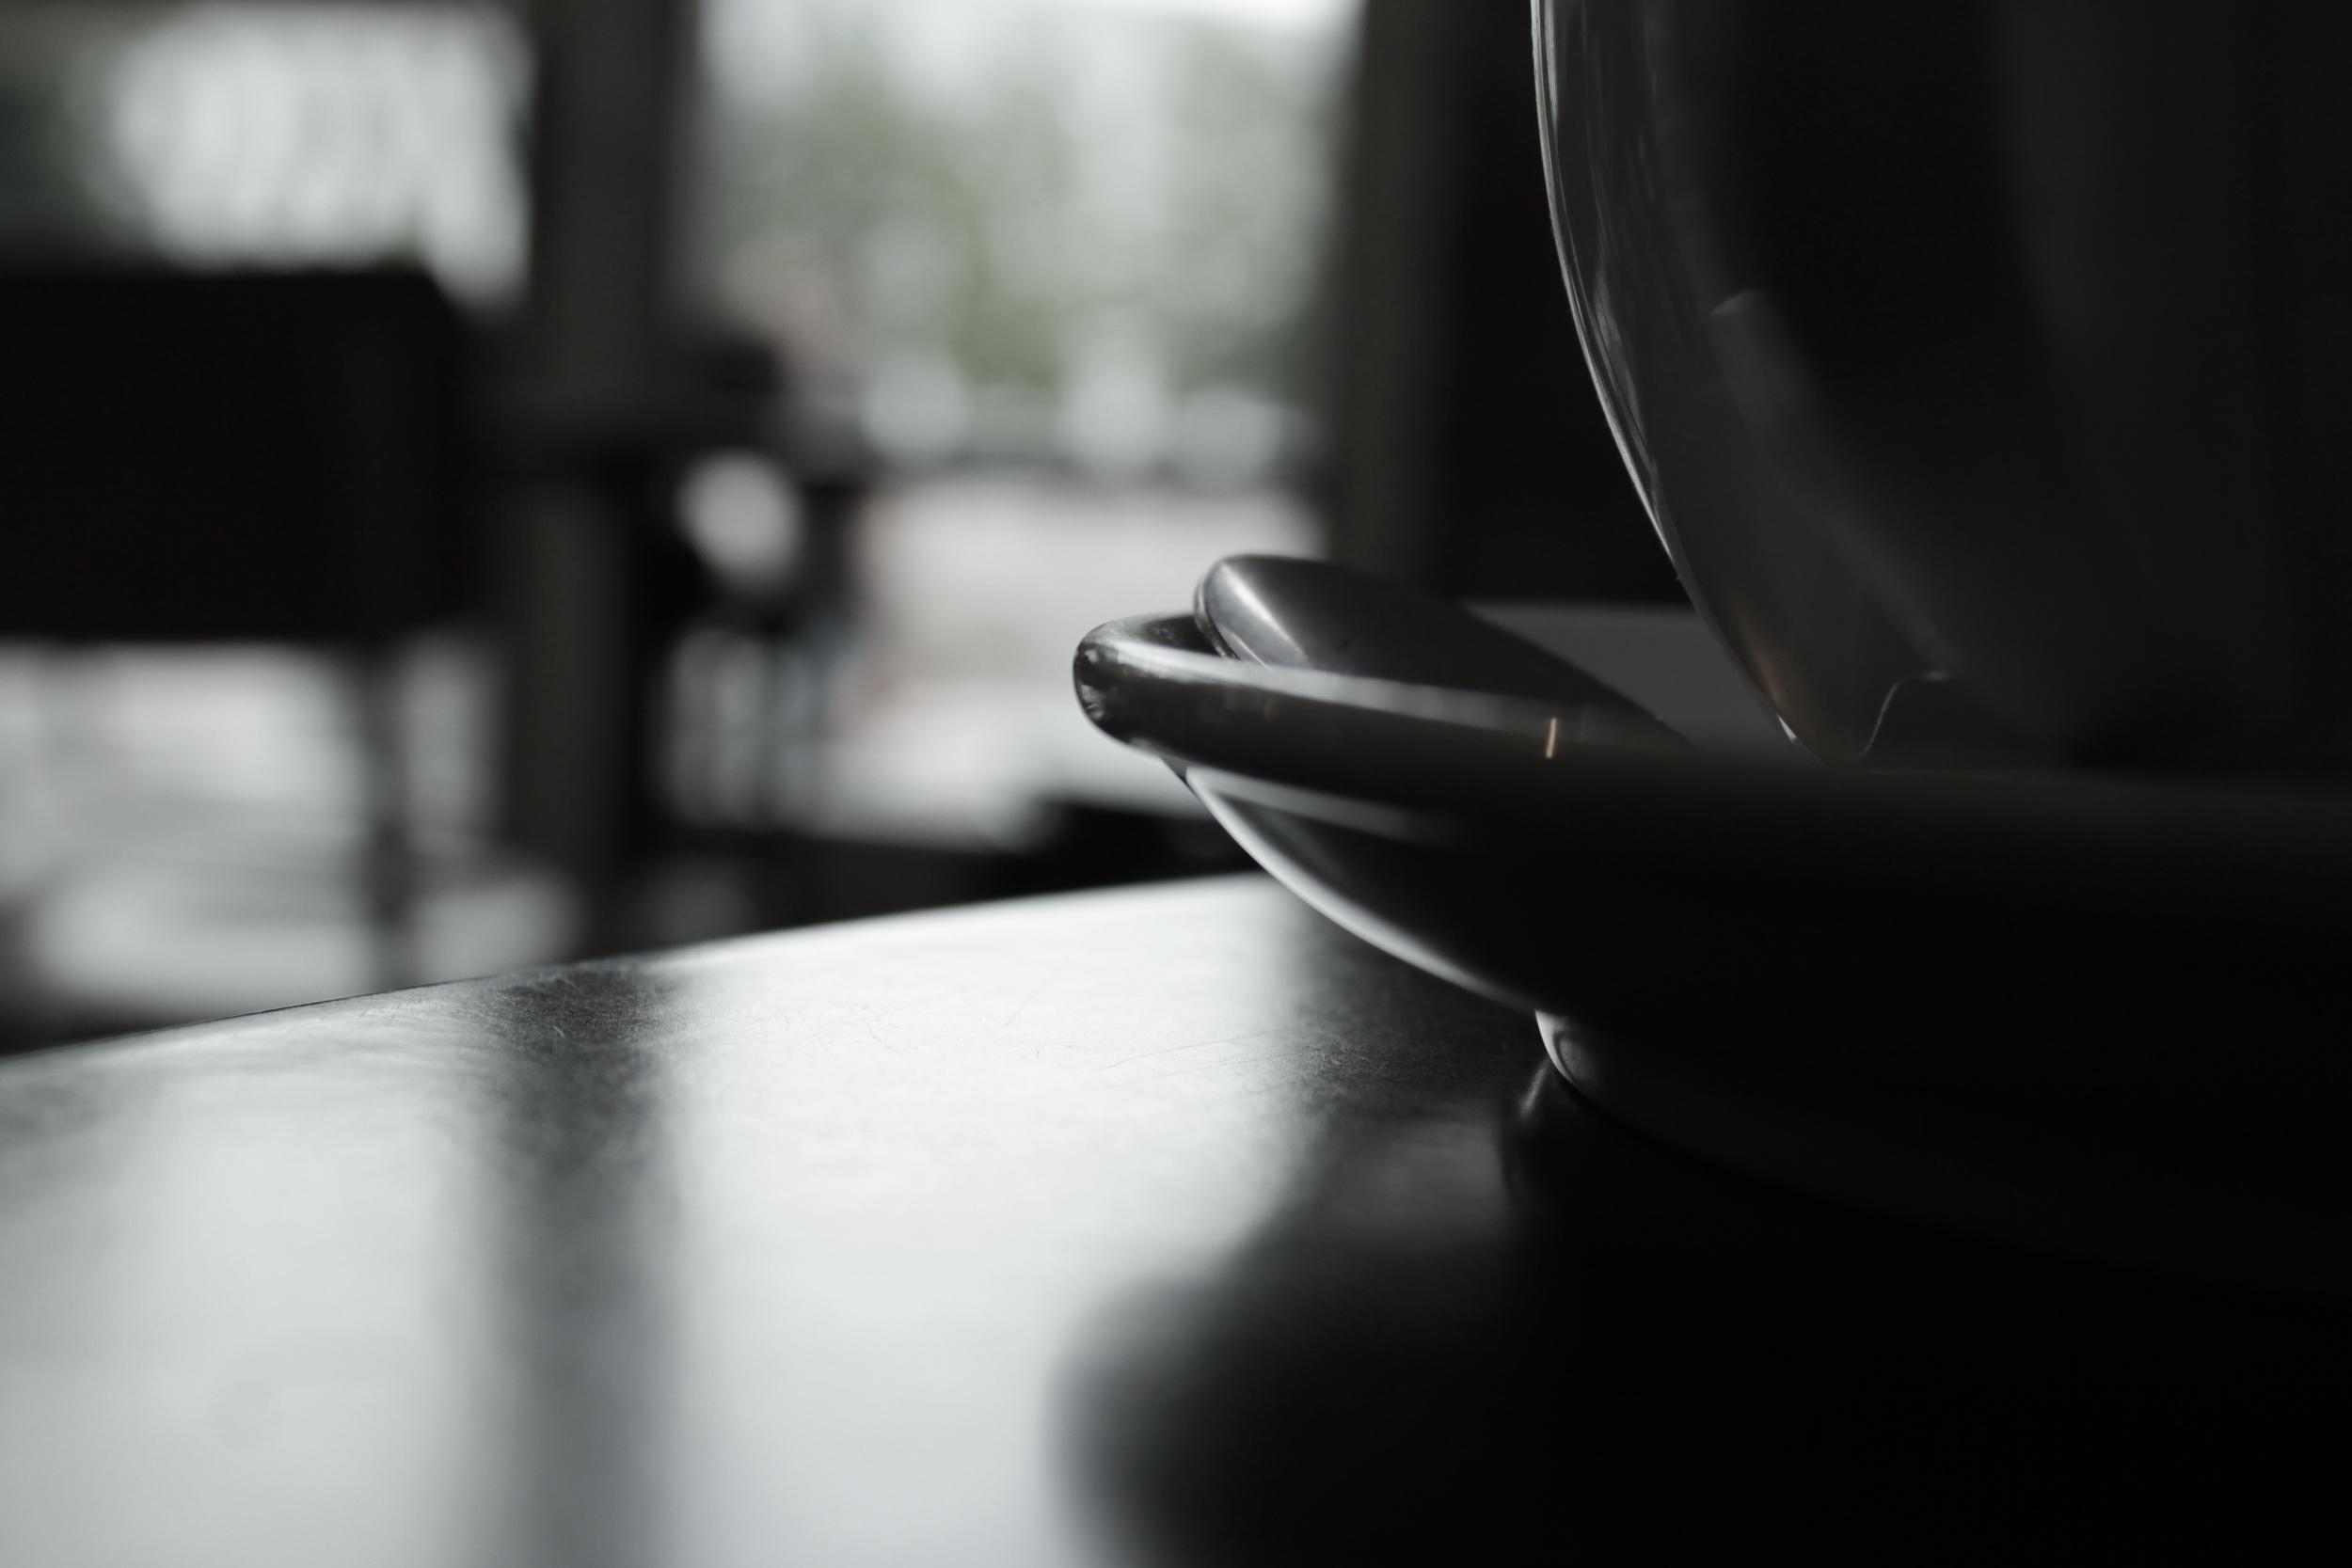 metafiktiivinen kahvikuppini lemmi henrik oranssi kukka kahvikuppi tunne.JPG